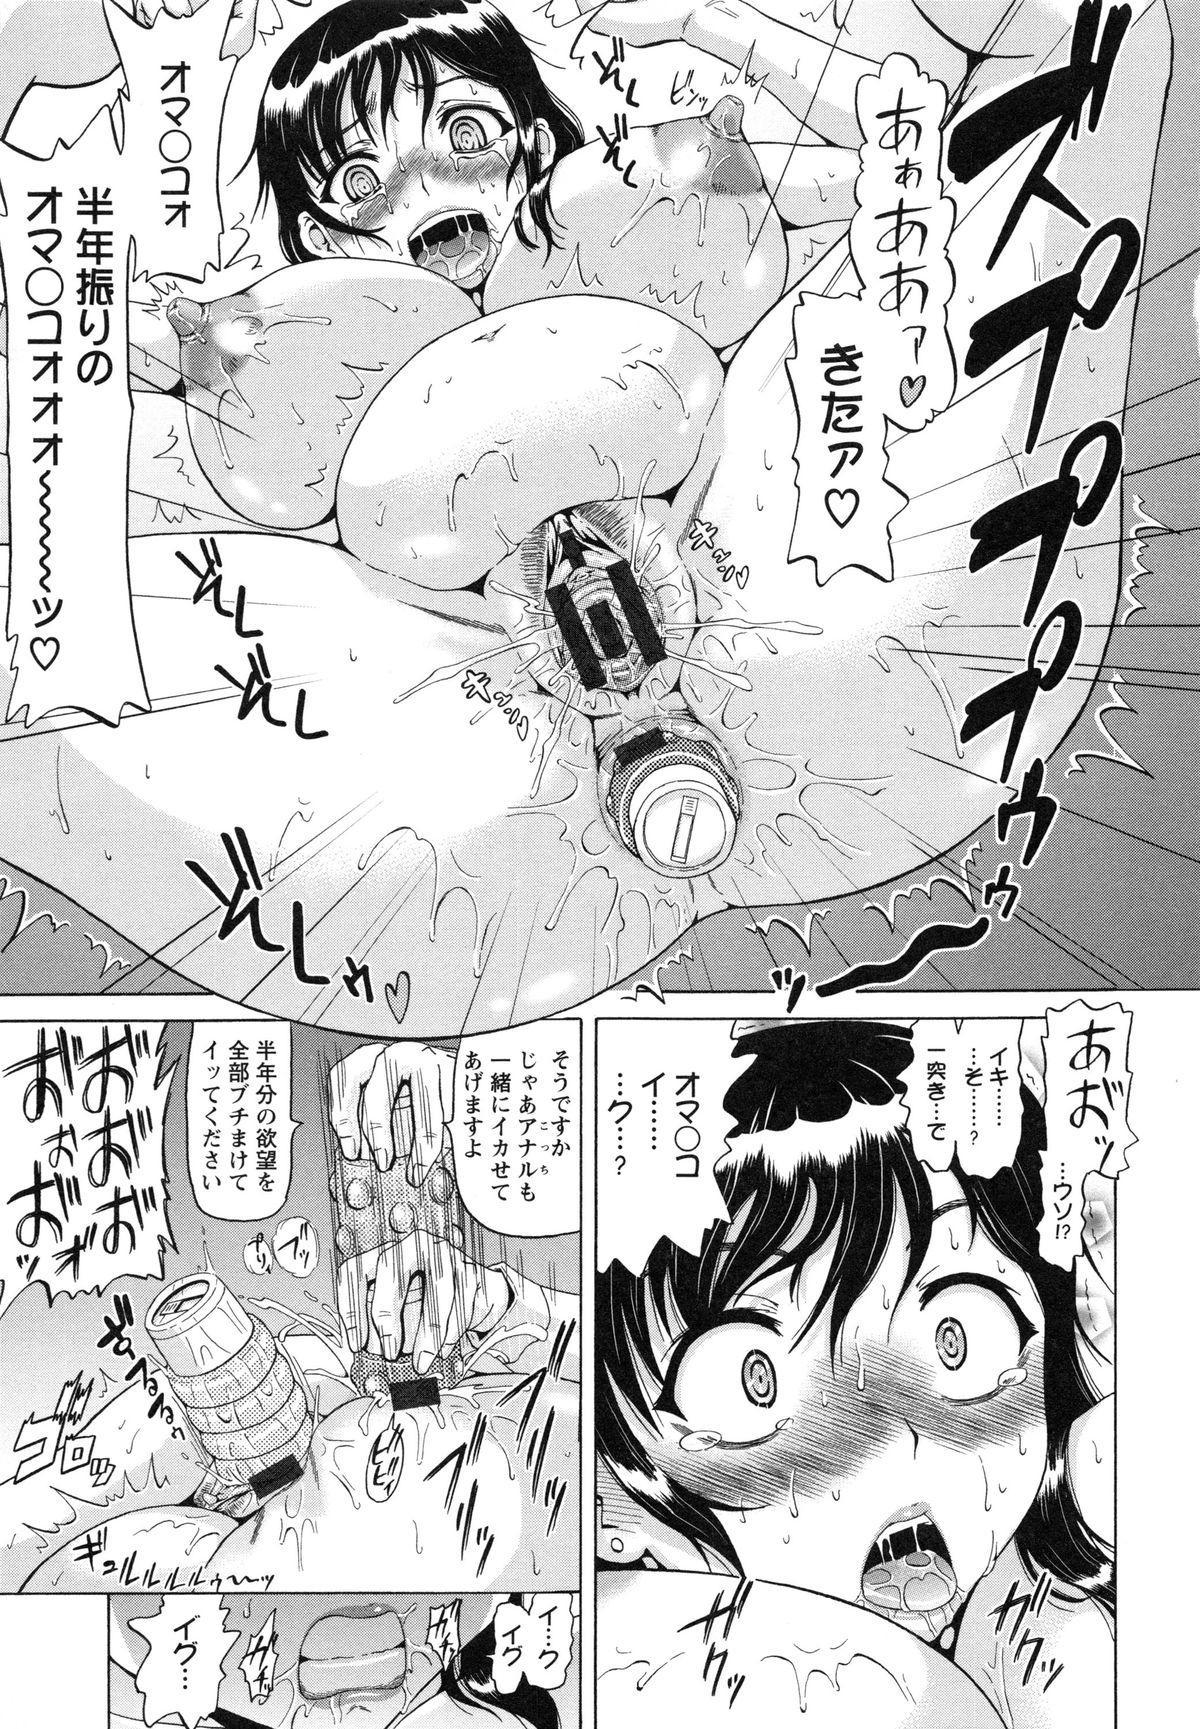 [Nukunuku Orange] Seikou ~Maeana Kanzen Houchi~ - Keep Anus in Anguish!!!! 24